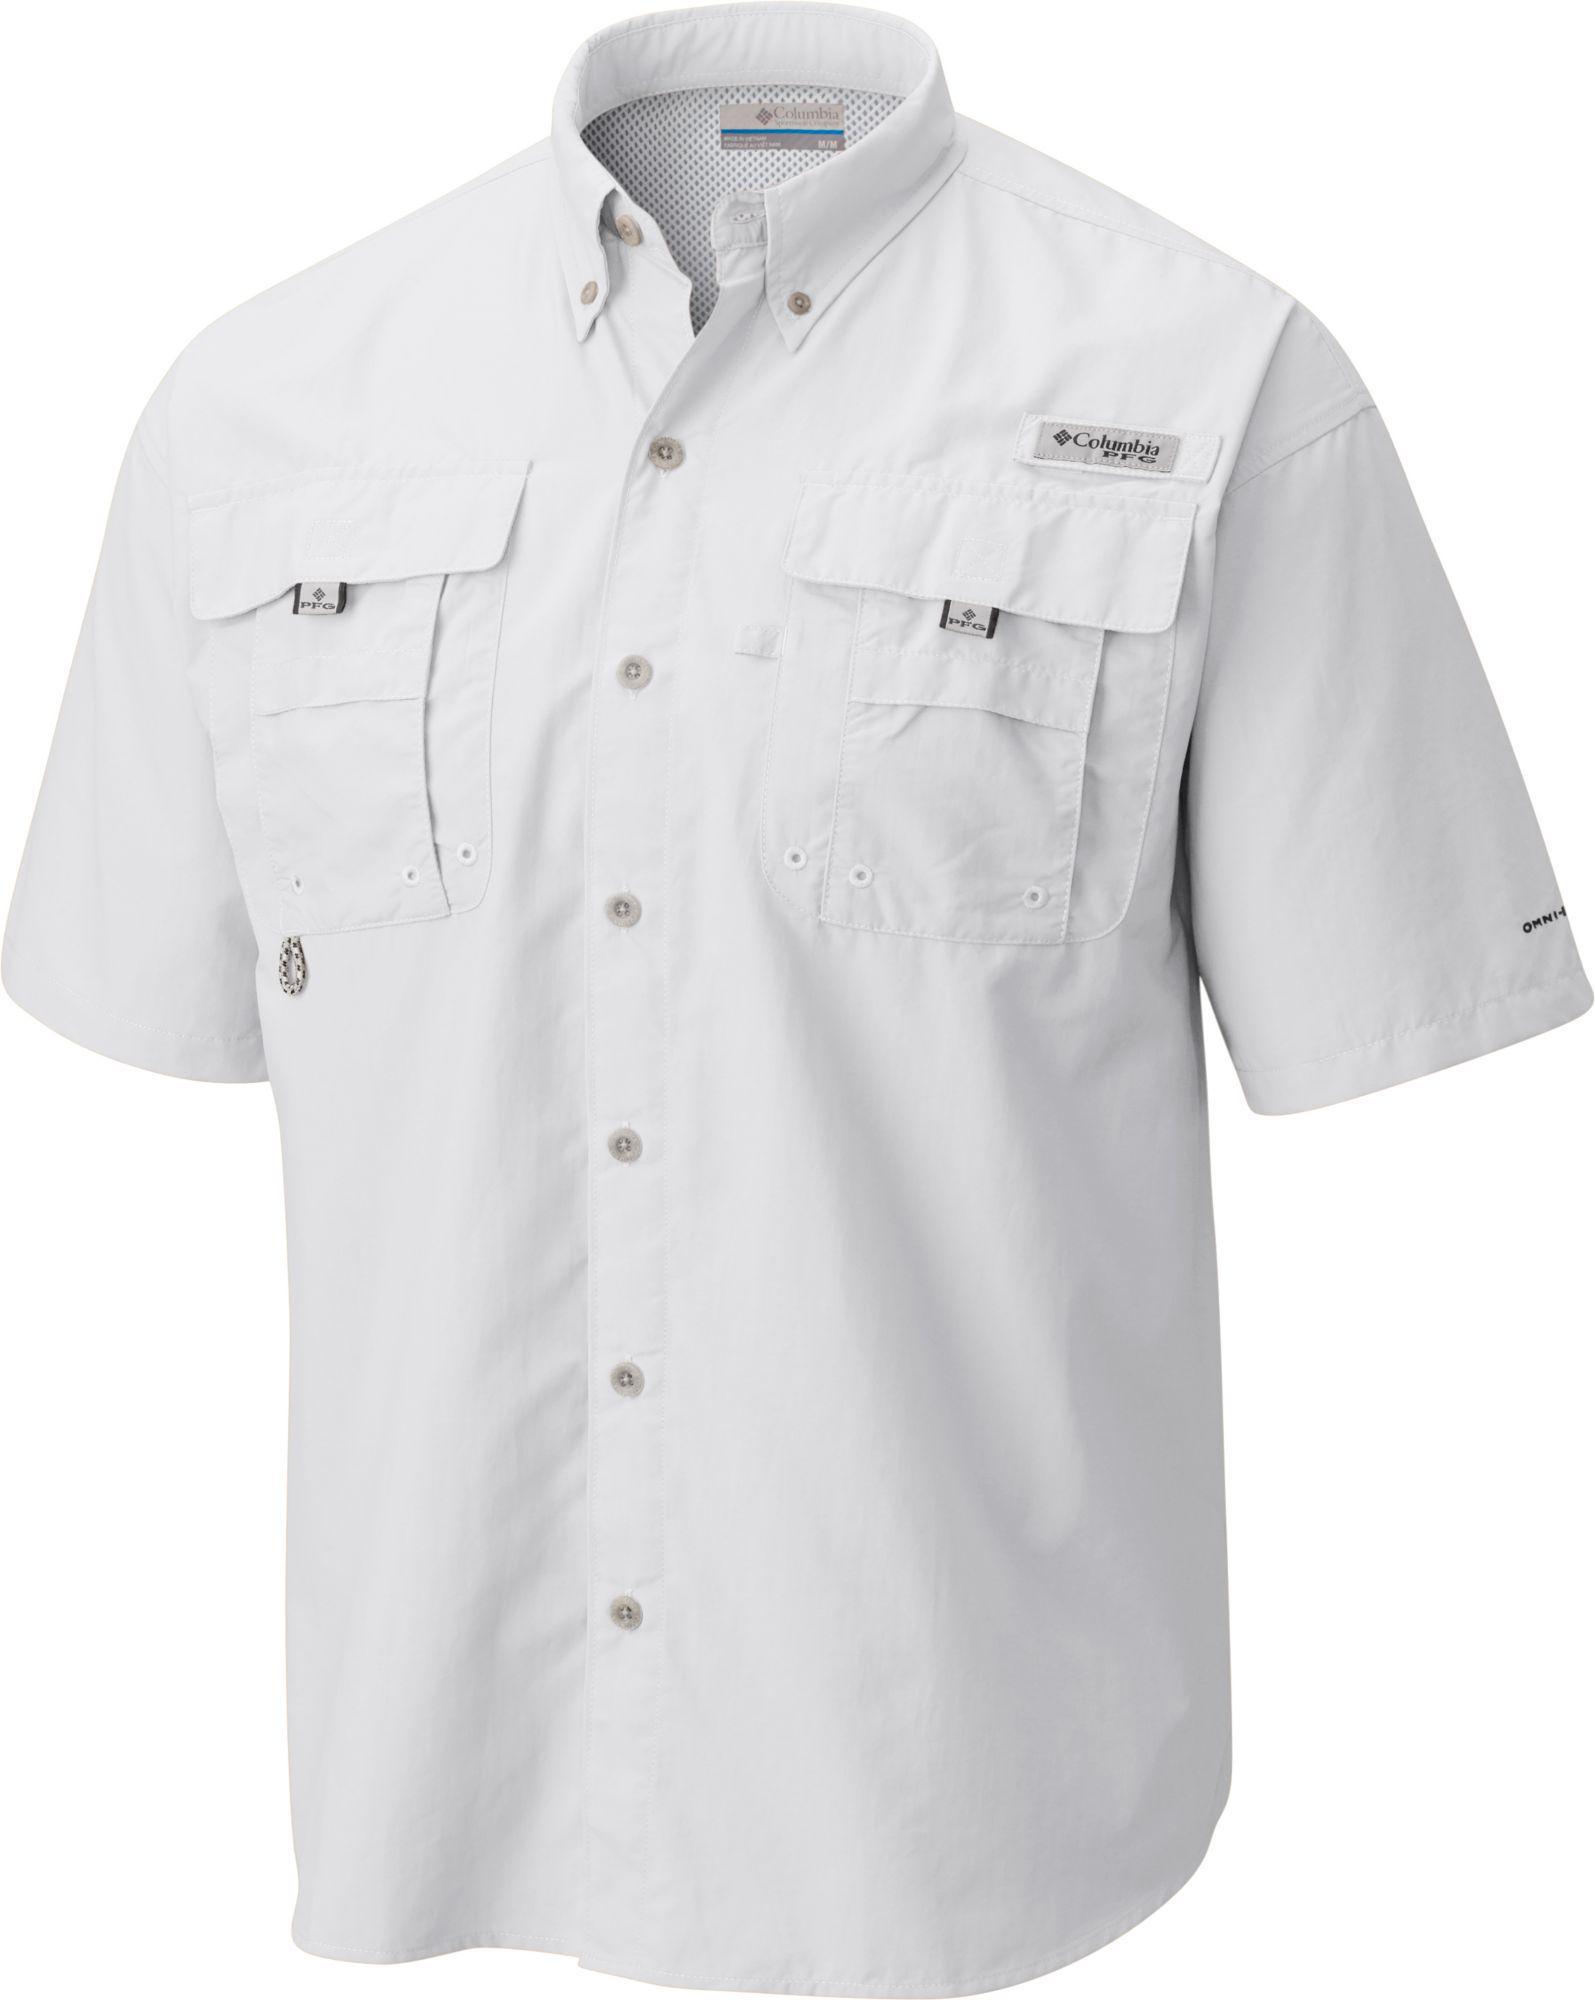 44940e28ff5 Columbia - White Pfg Bahama Button Down Shirt for Men - Lyst. View  fullscreen